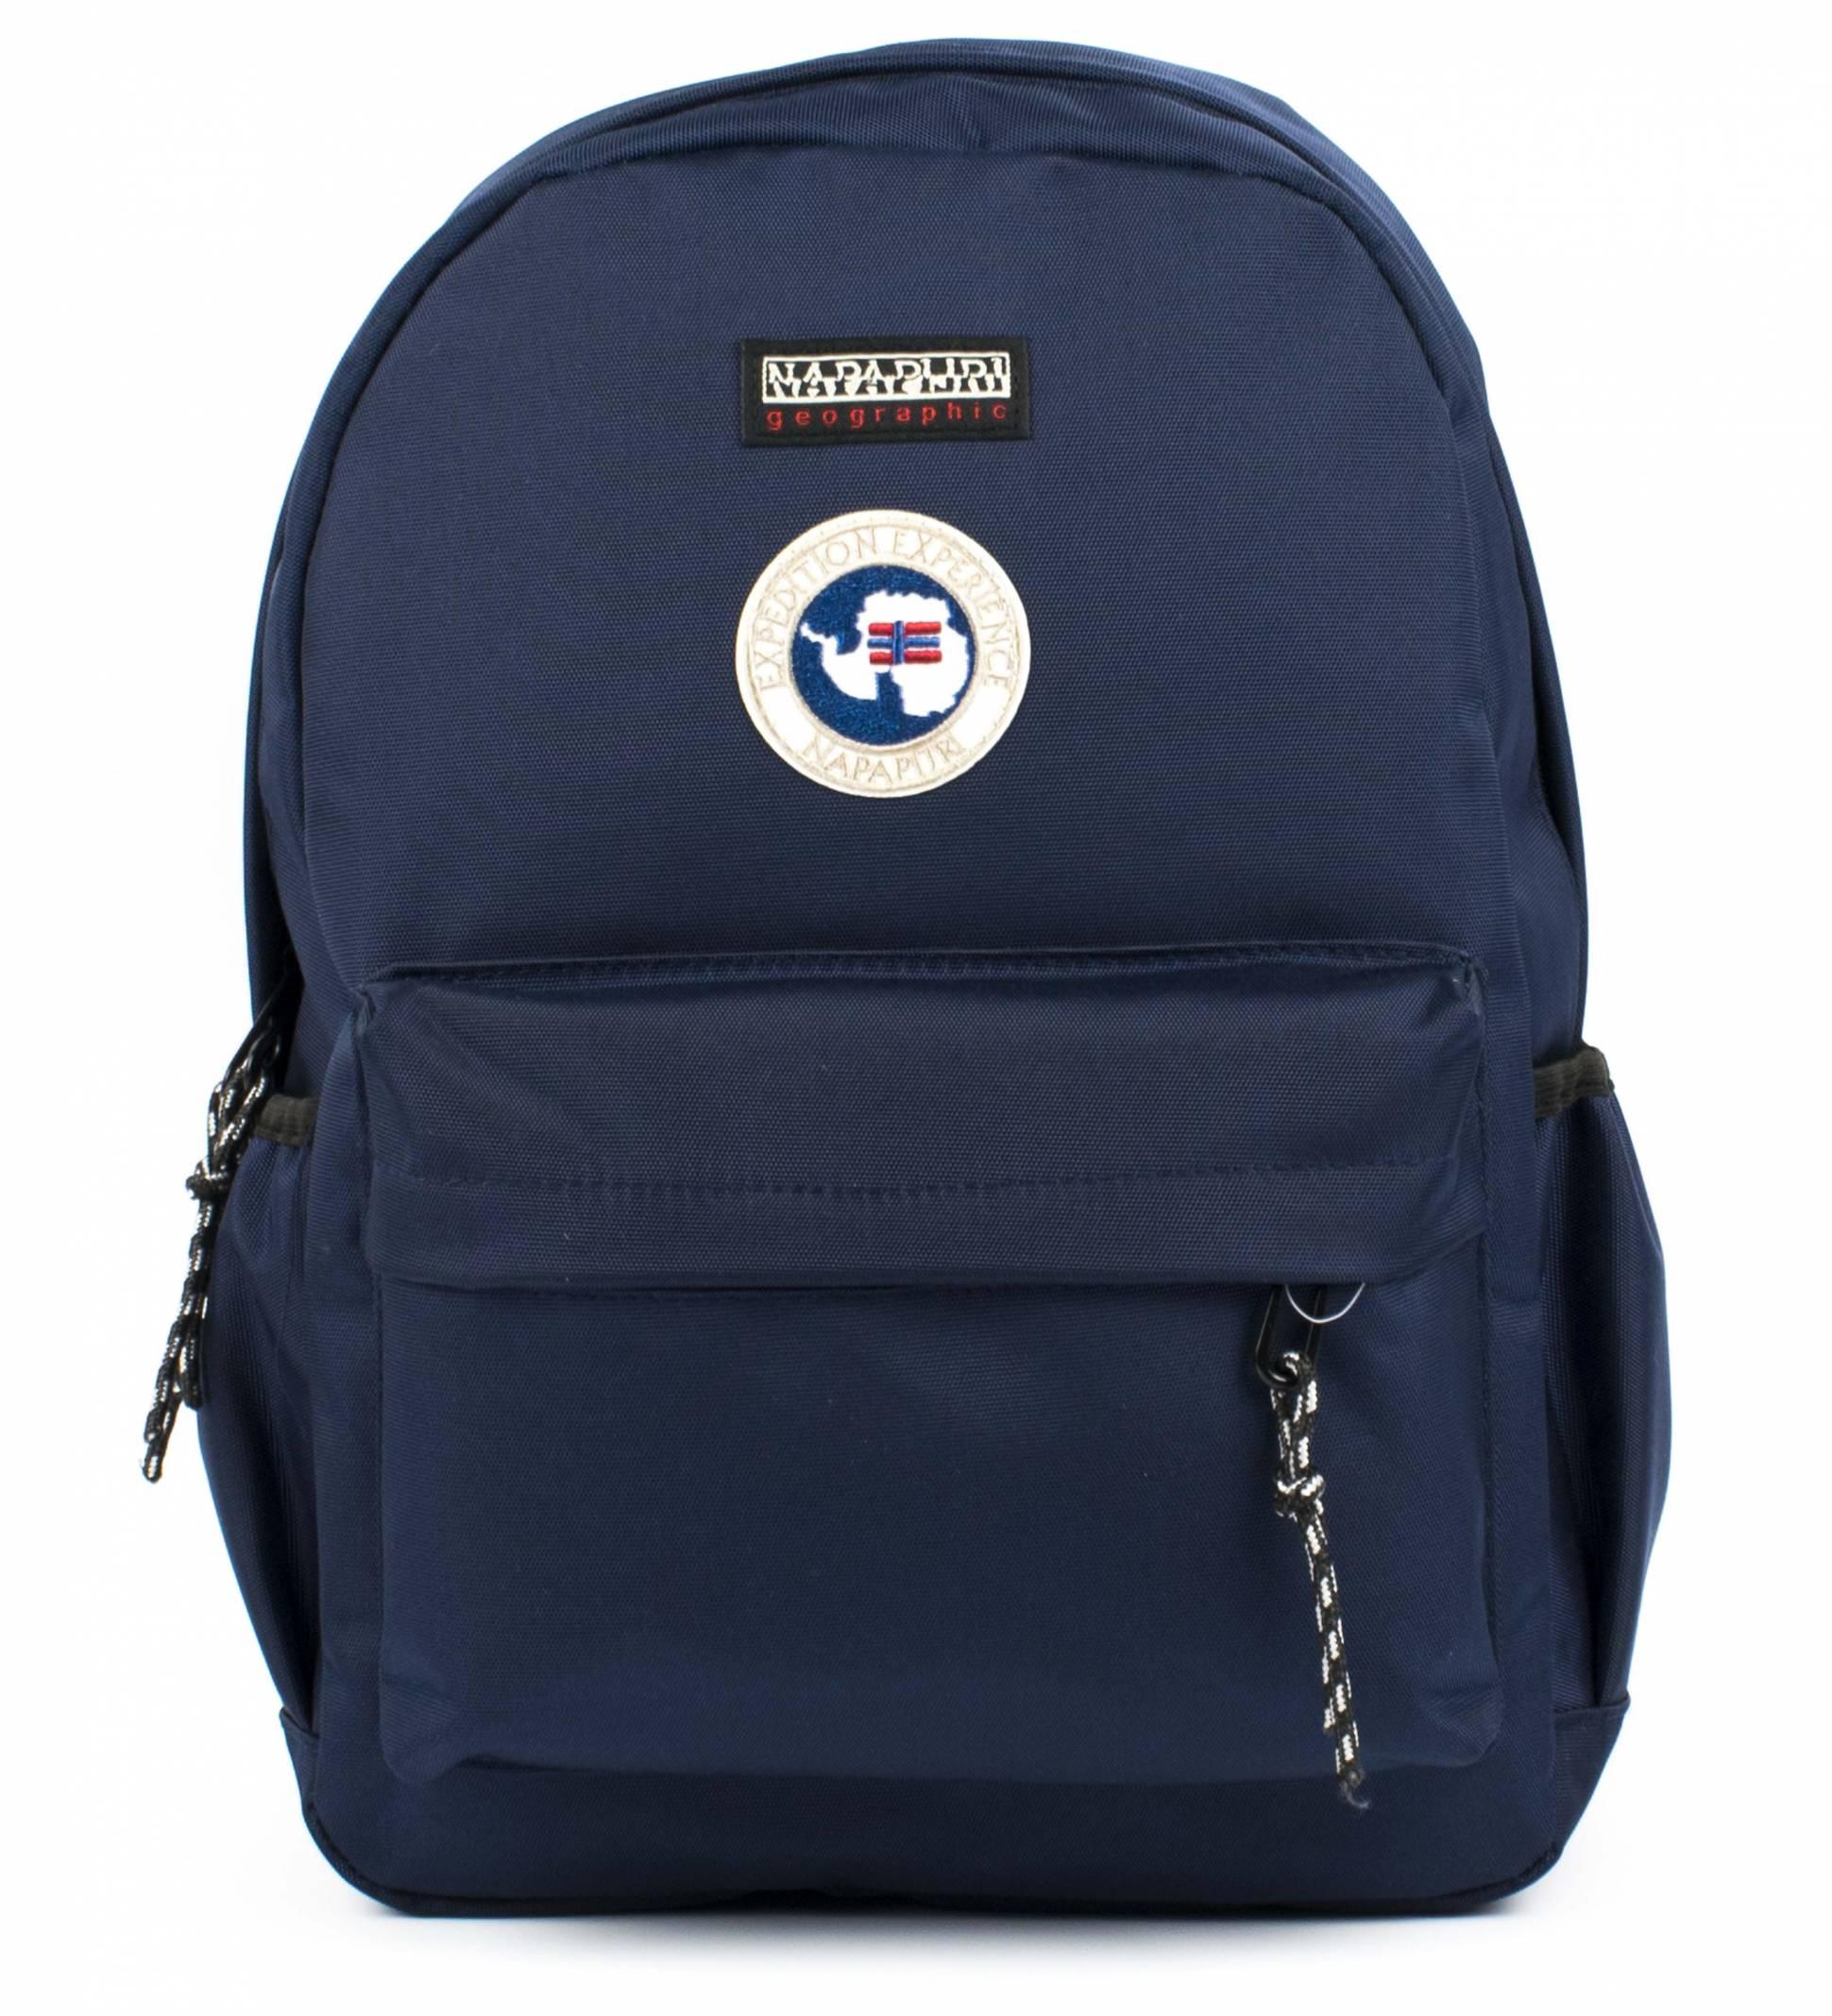 55ae8484c267 Рюкзак Napapijri Geographic NJ168 темно-синий купить по цене 2 200 ...